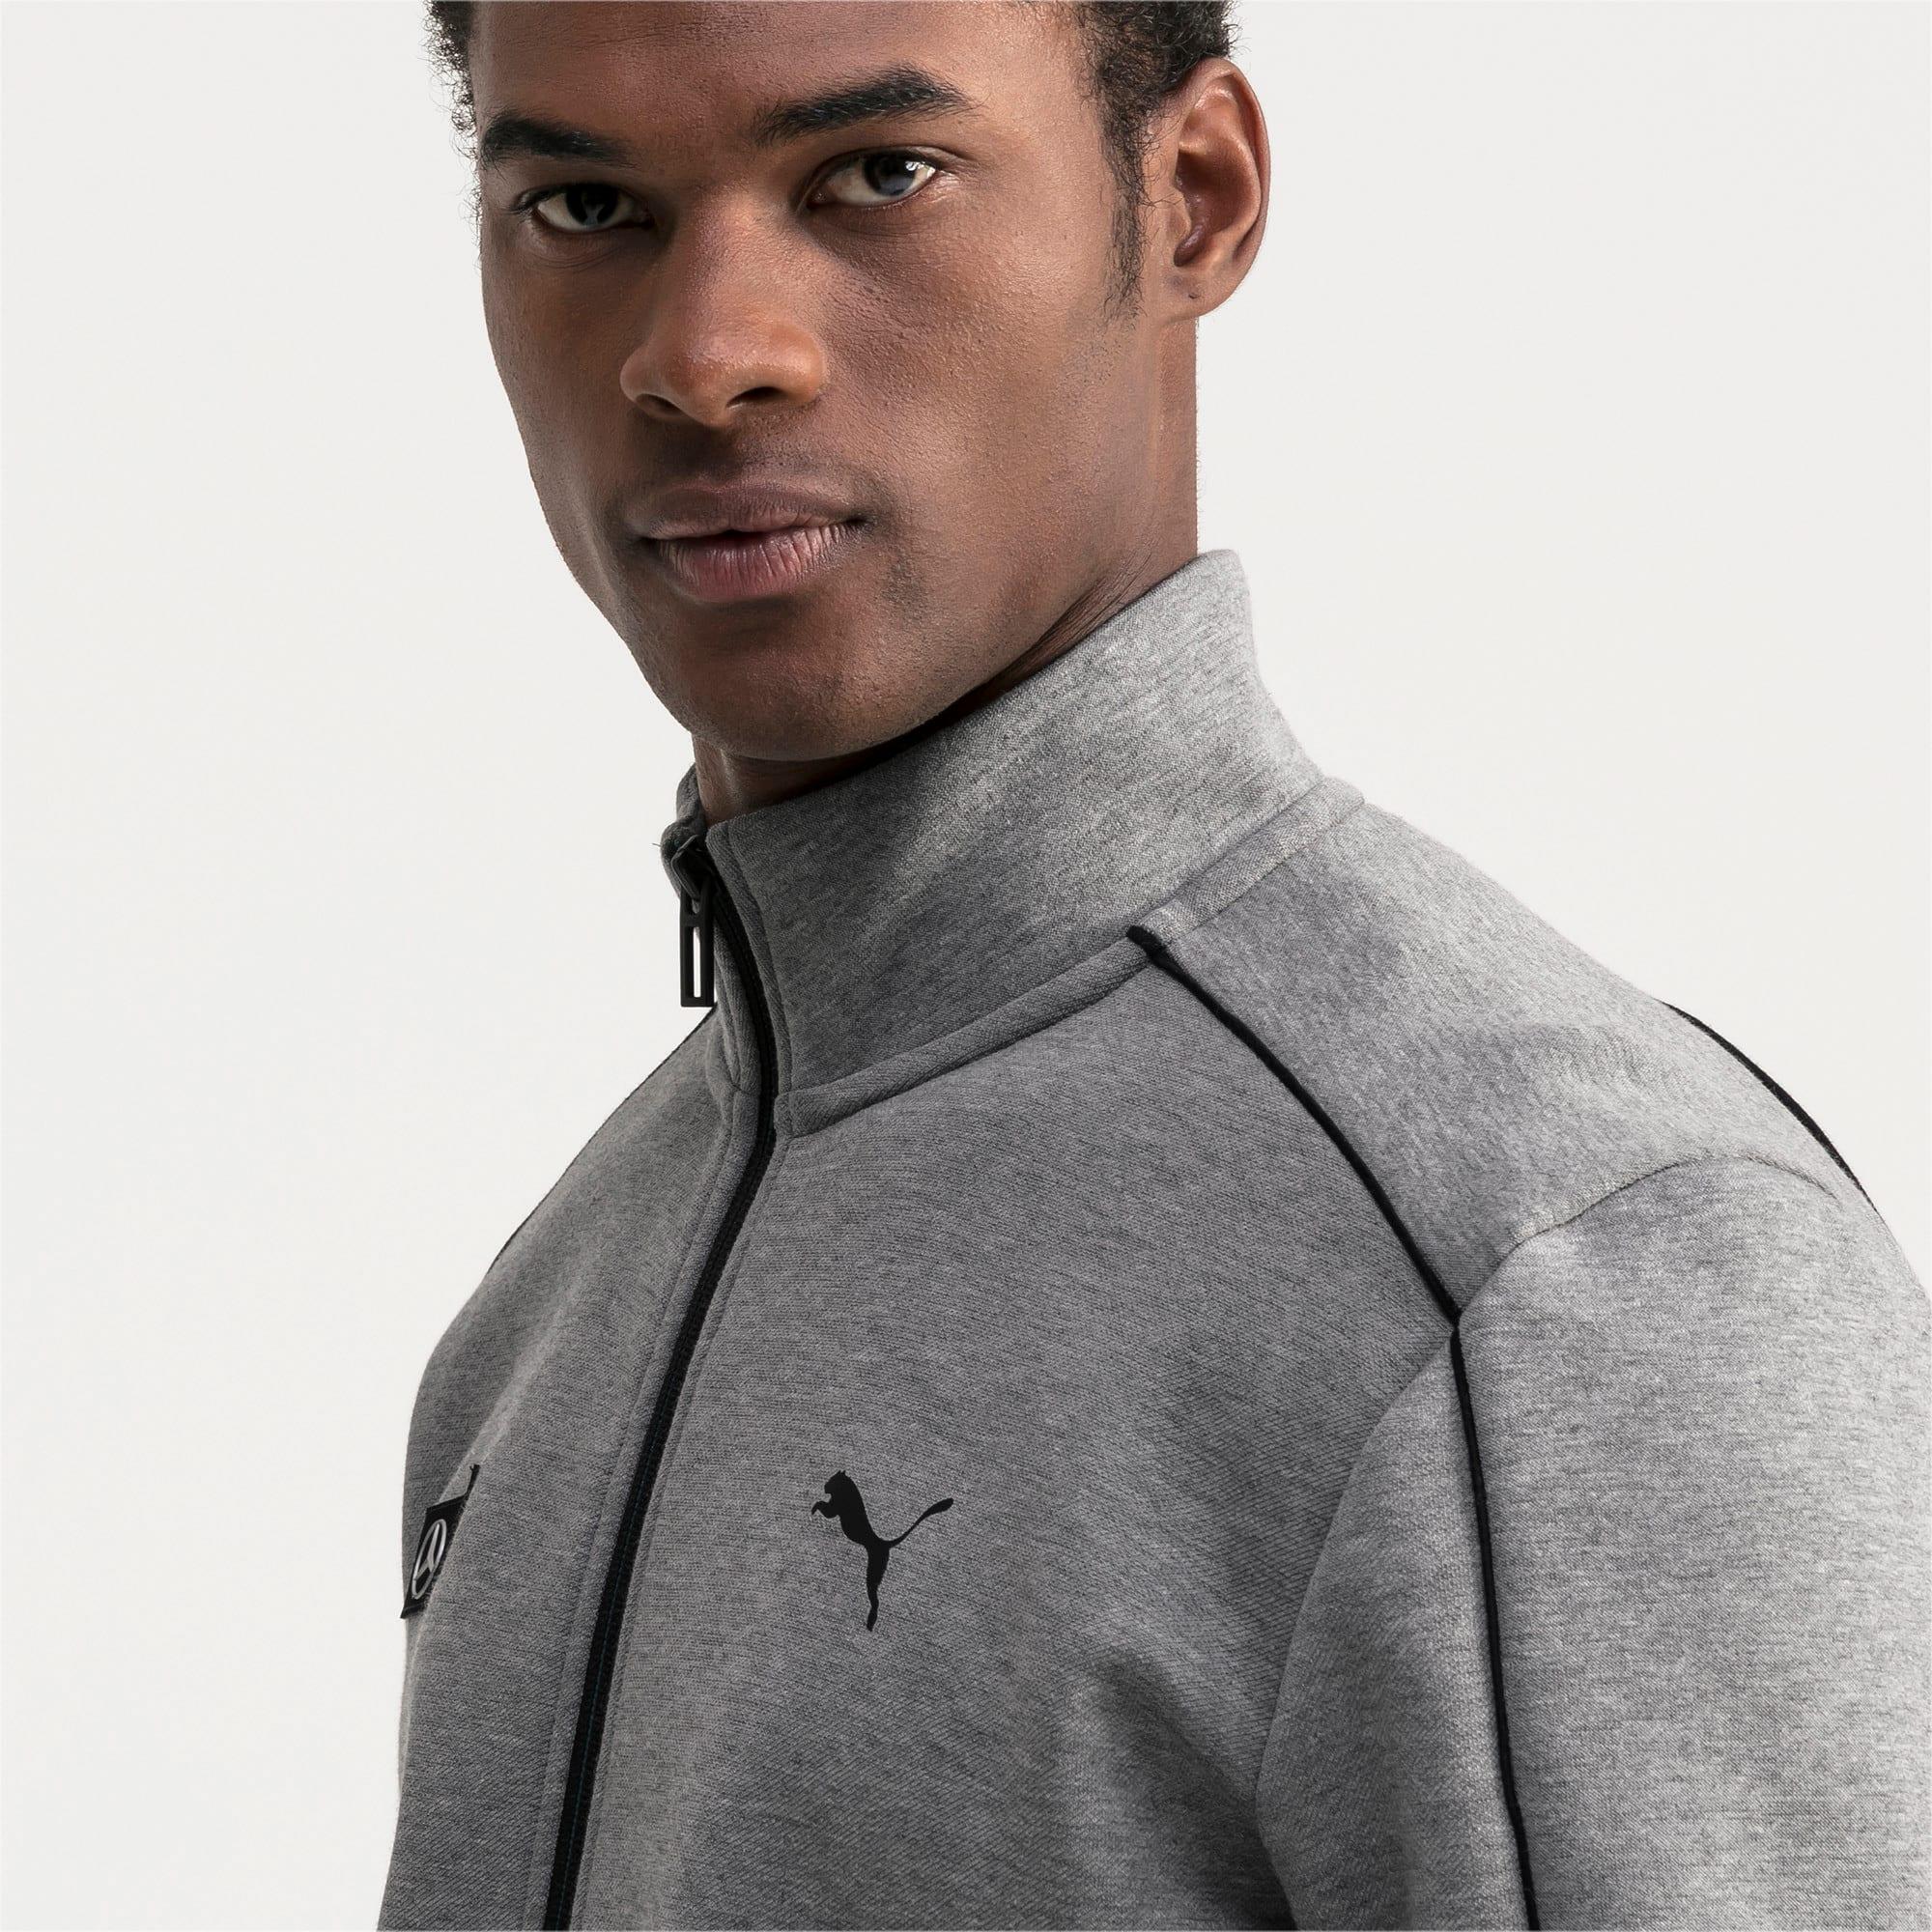 Thumbnail 3 of Mercedes AMG Petronas Men's Sweat Jacket, Medium Gray Heather, medium